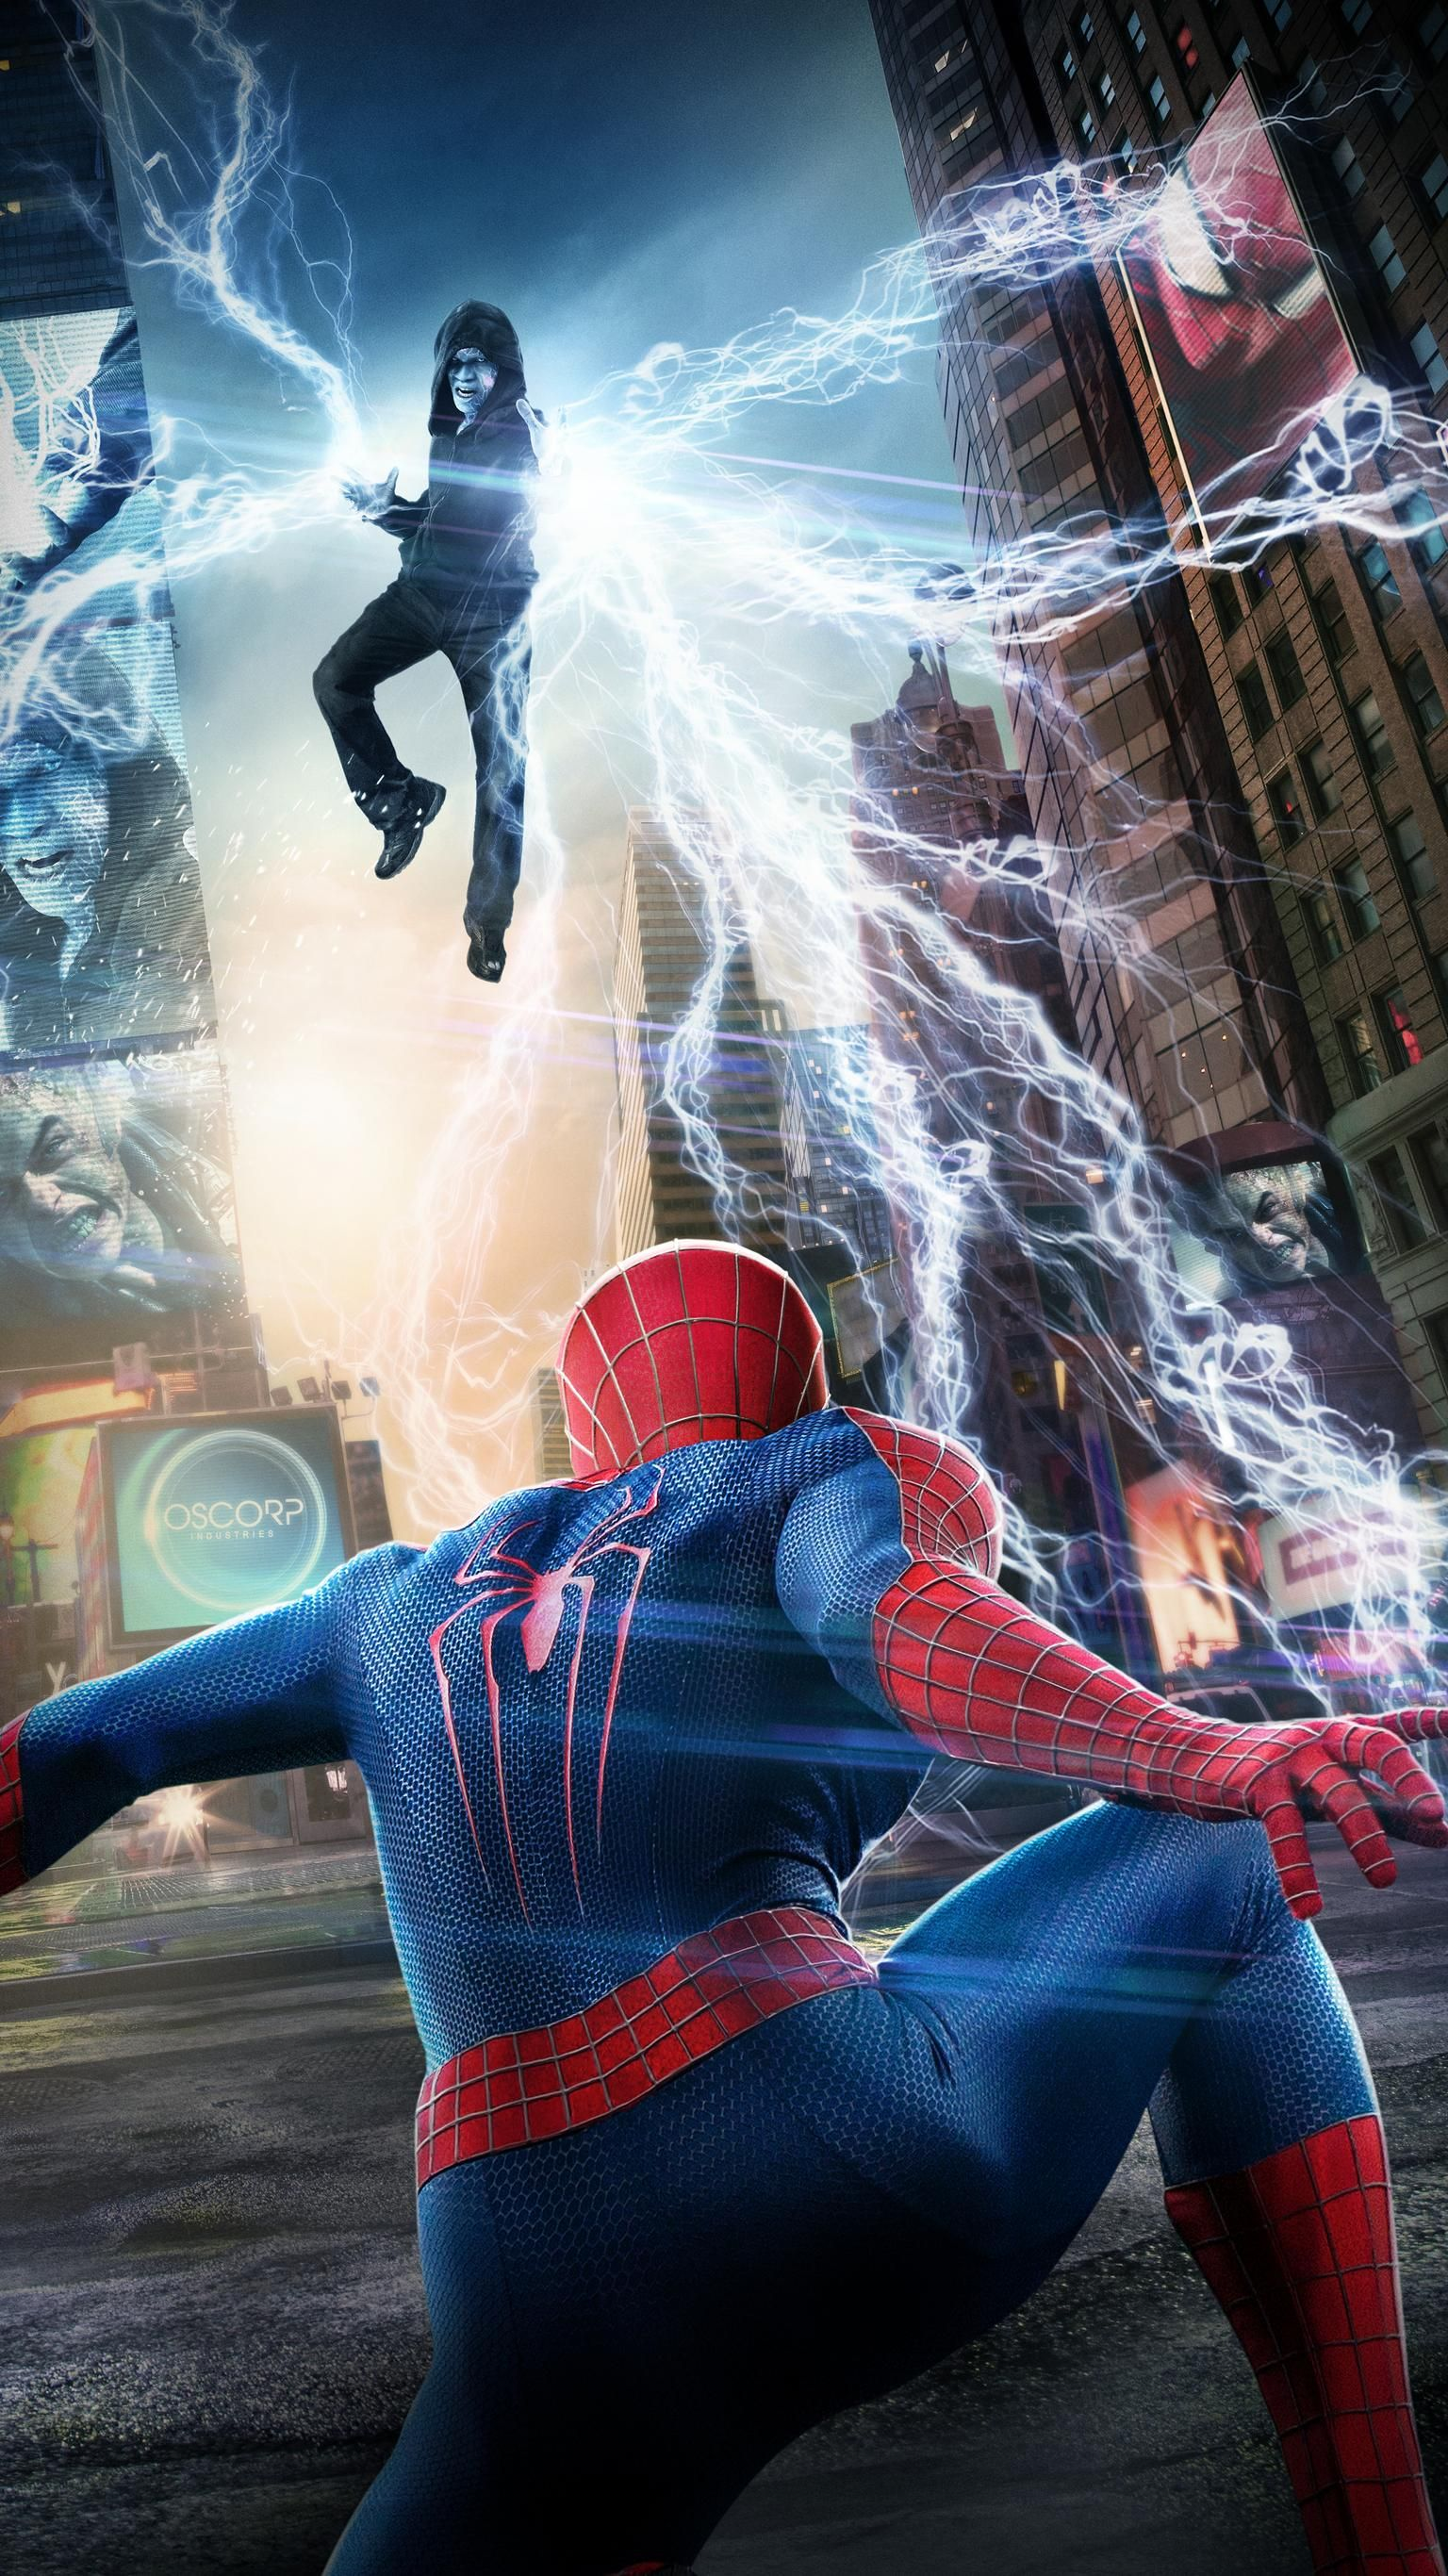 The Amazing Spider Man 2 2014 Phone Wallpaper Moviemania The Amazing Spiderman 2 Spiderman Spider Man 2